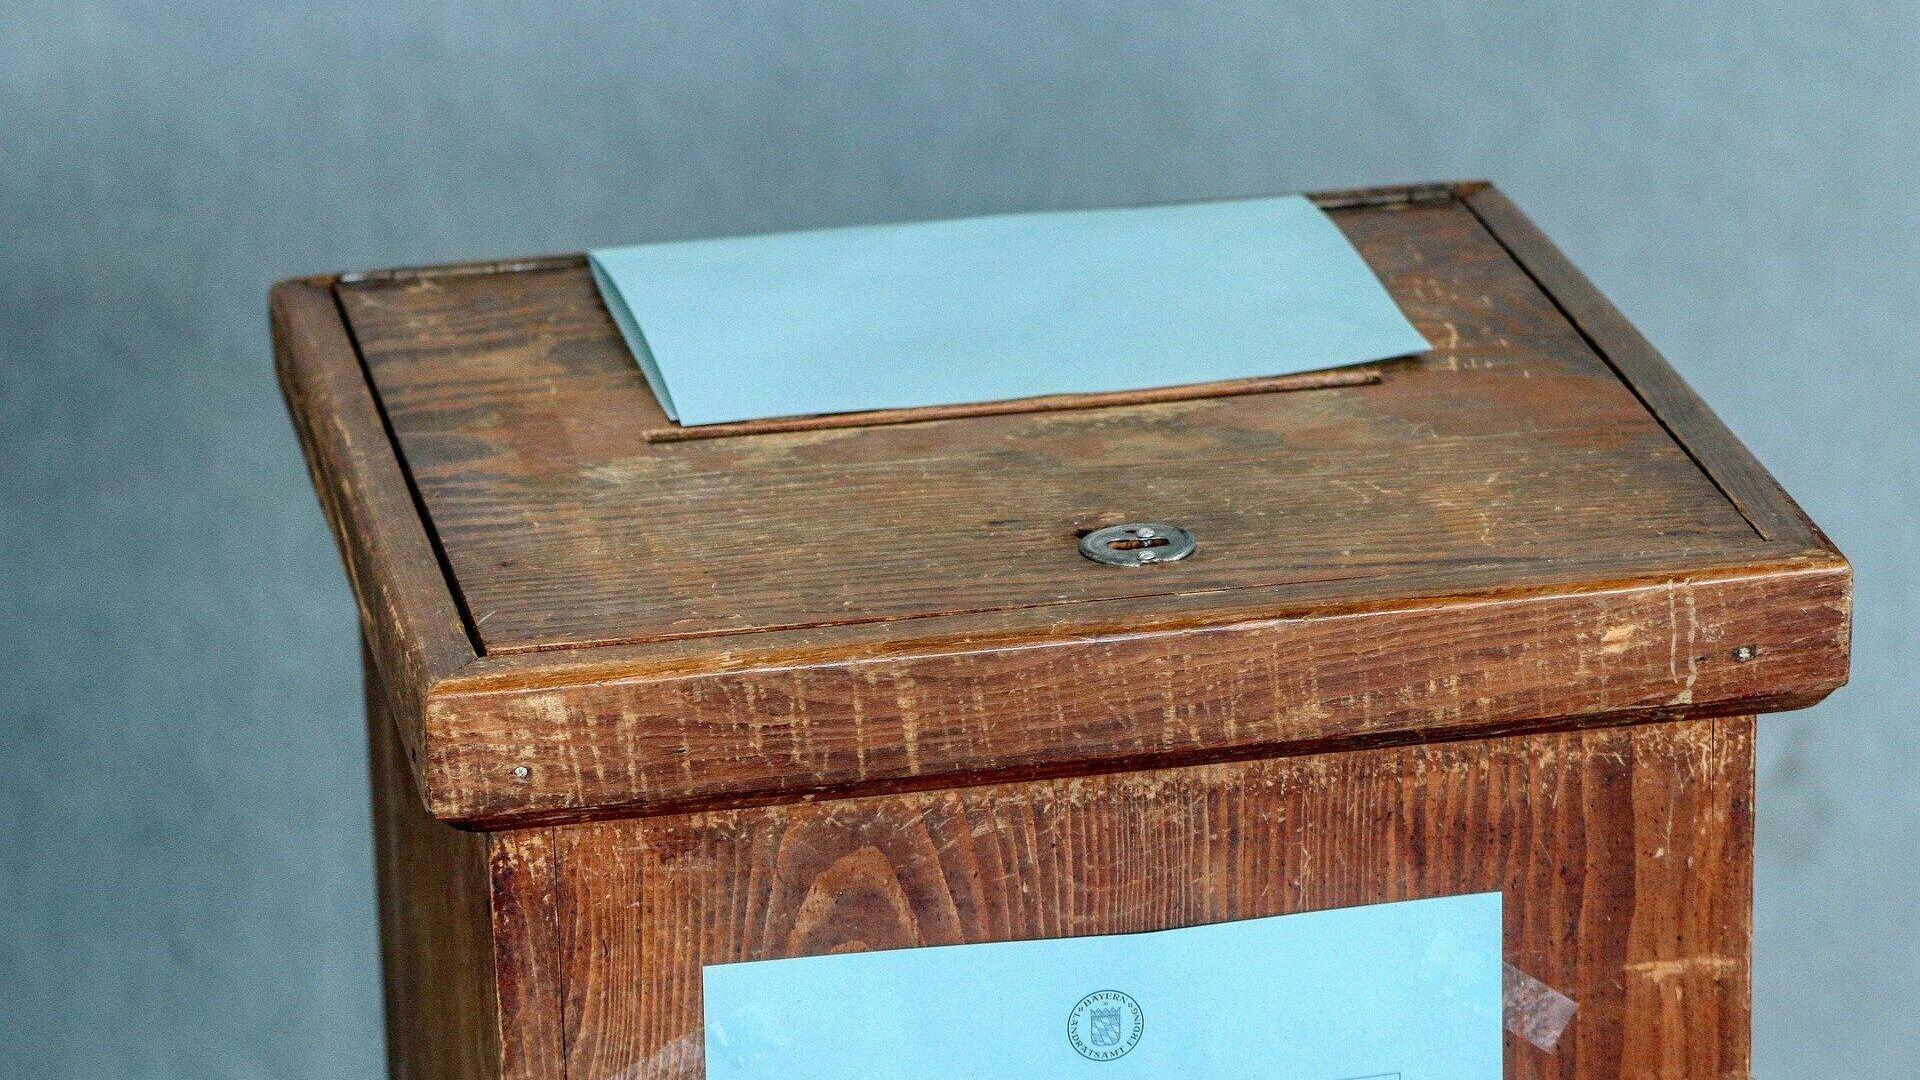 Wahlurne (Symbolbild) - SNA, 1920, 15.07.2021